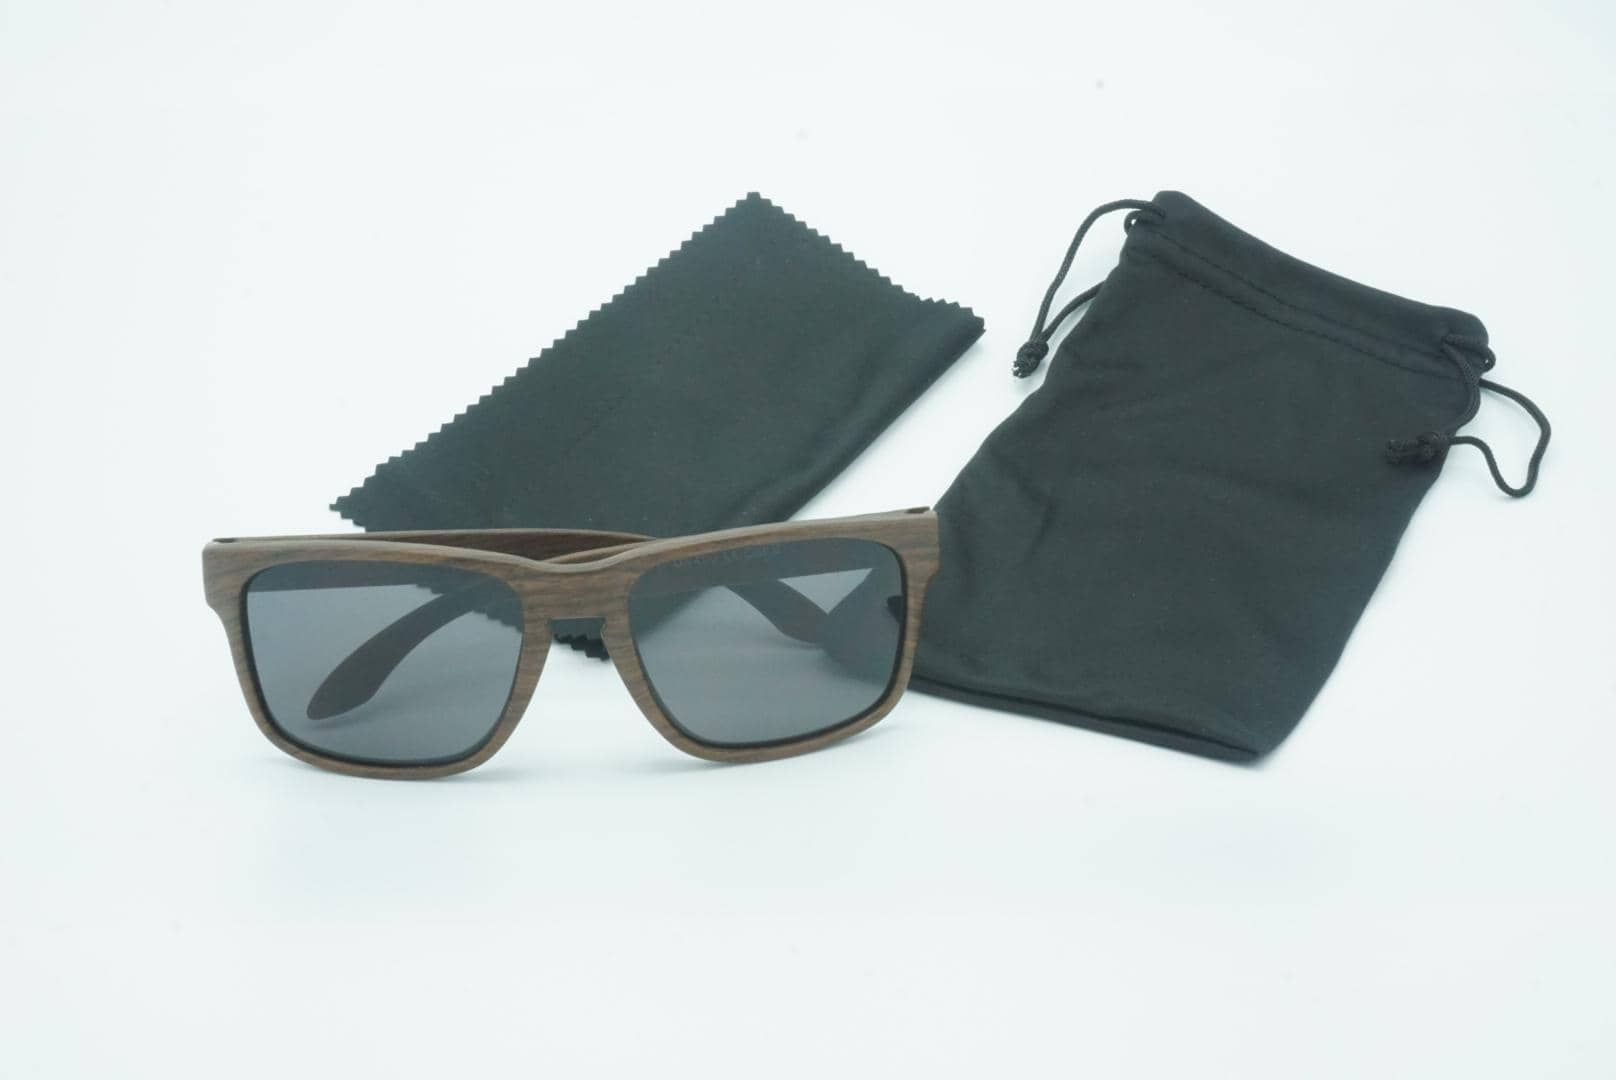 4goodz Barcelona grey - houtlook wayfarer zonnebril - grijs - Uv400